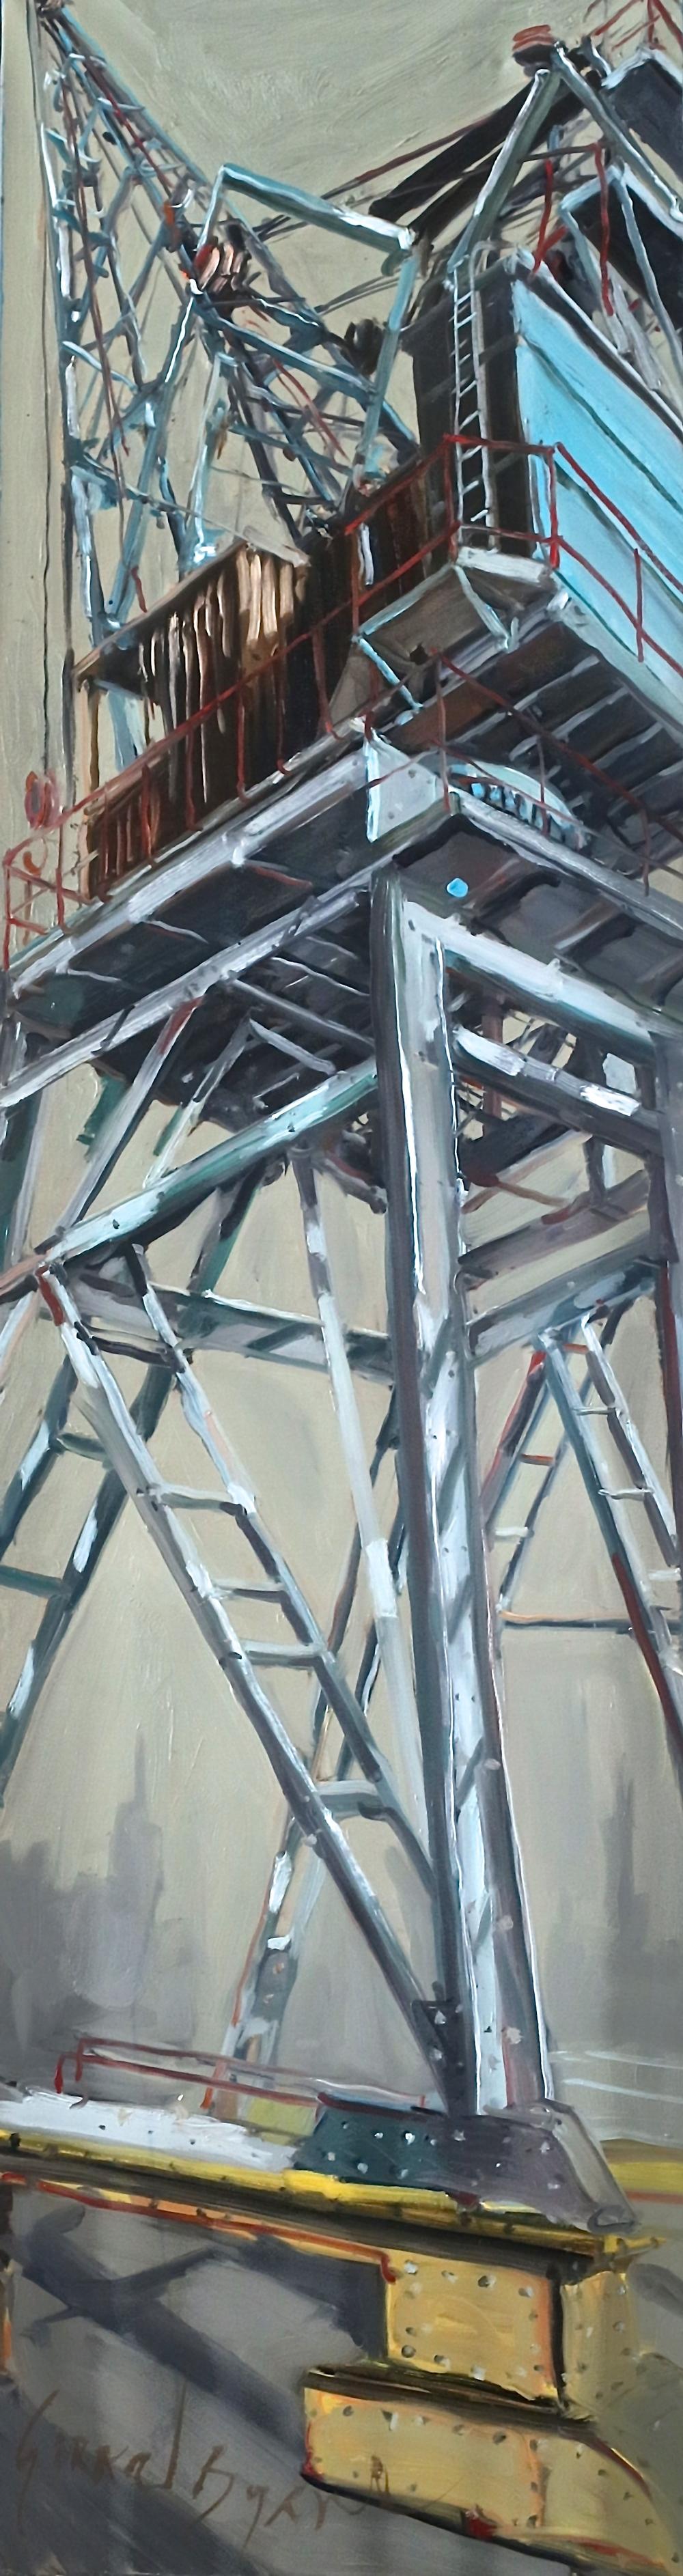 Gerard_Byrne_'Hooked'_oil_on_canvas_45x155cm.jpg